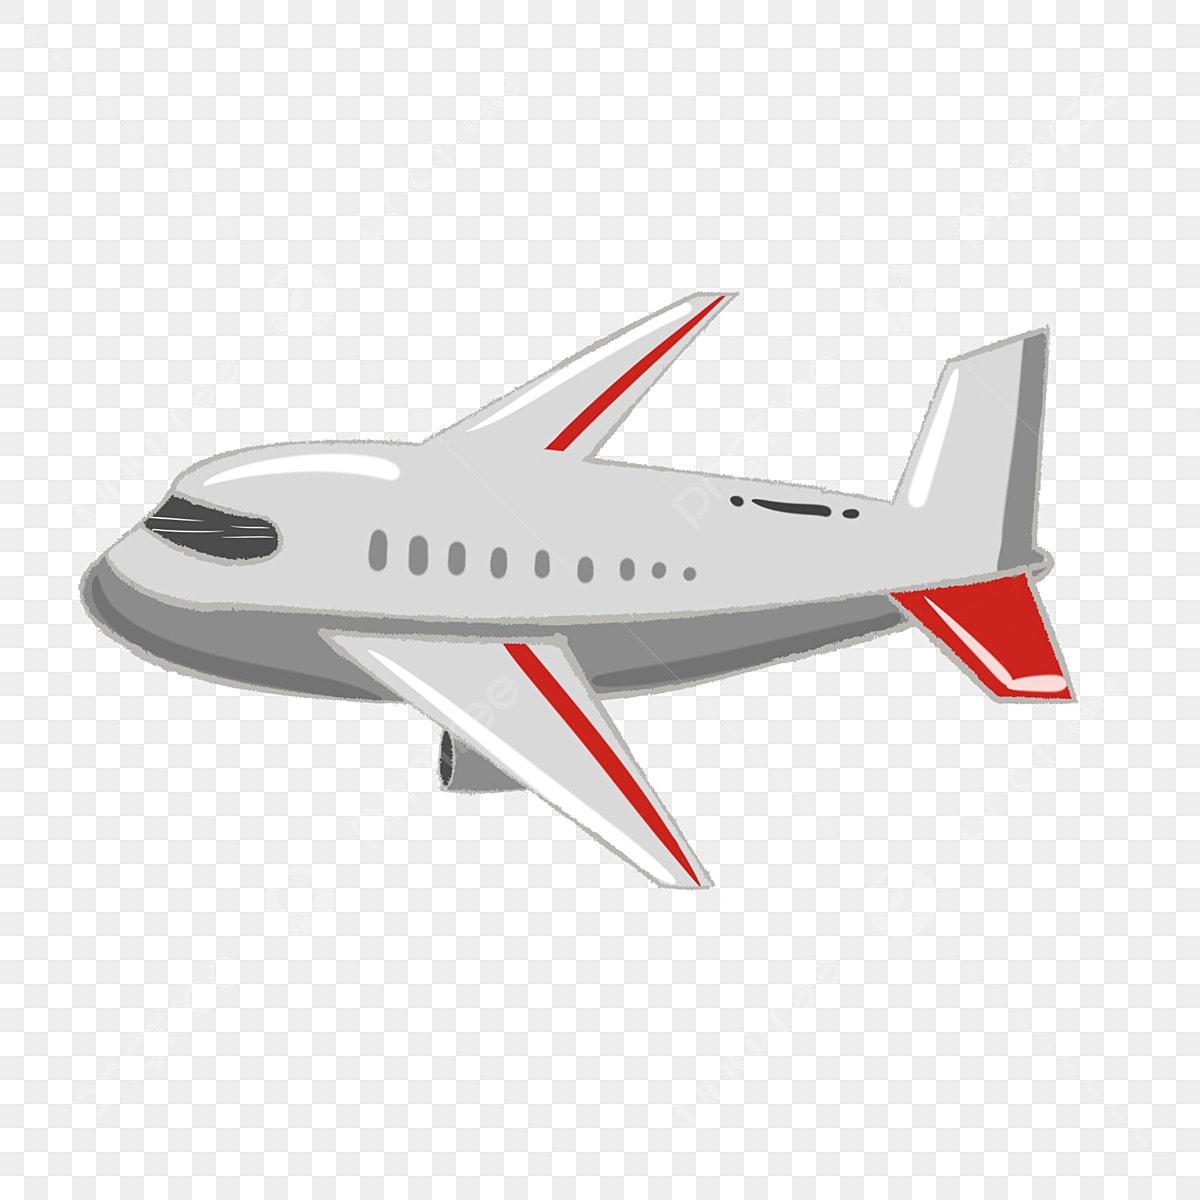 Flying Airplane Cartoon Illustration Gray Airplane Cartoon